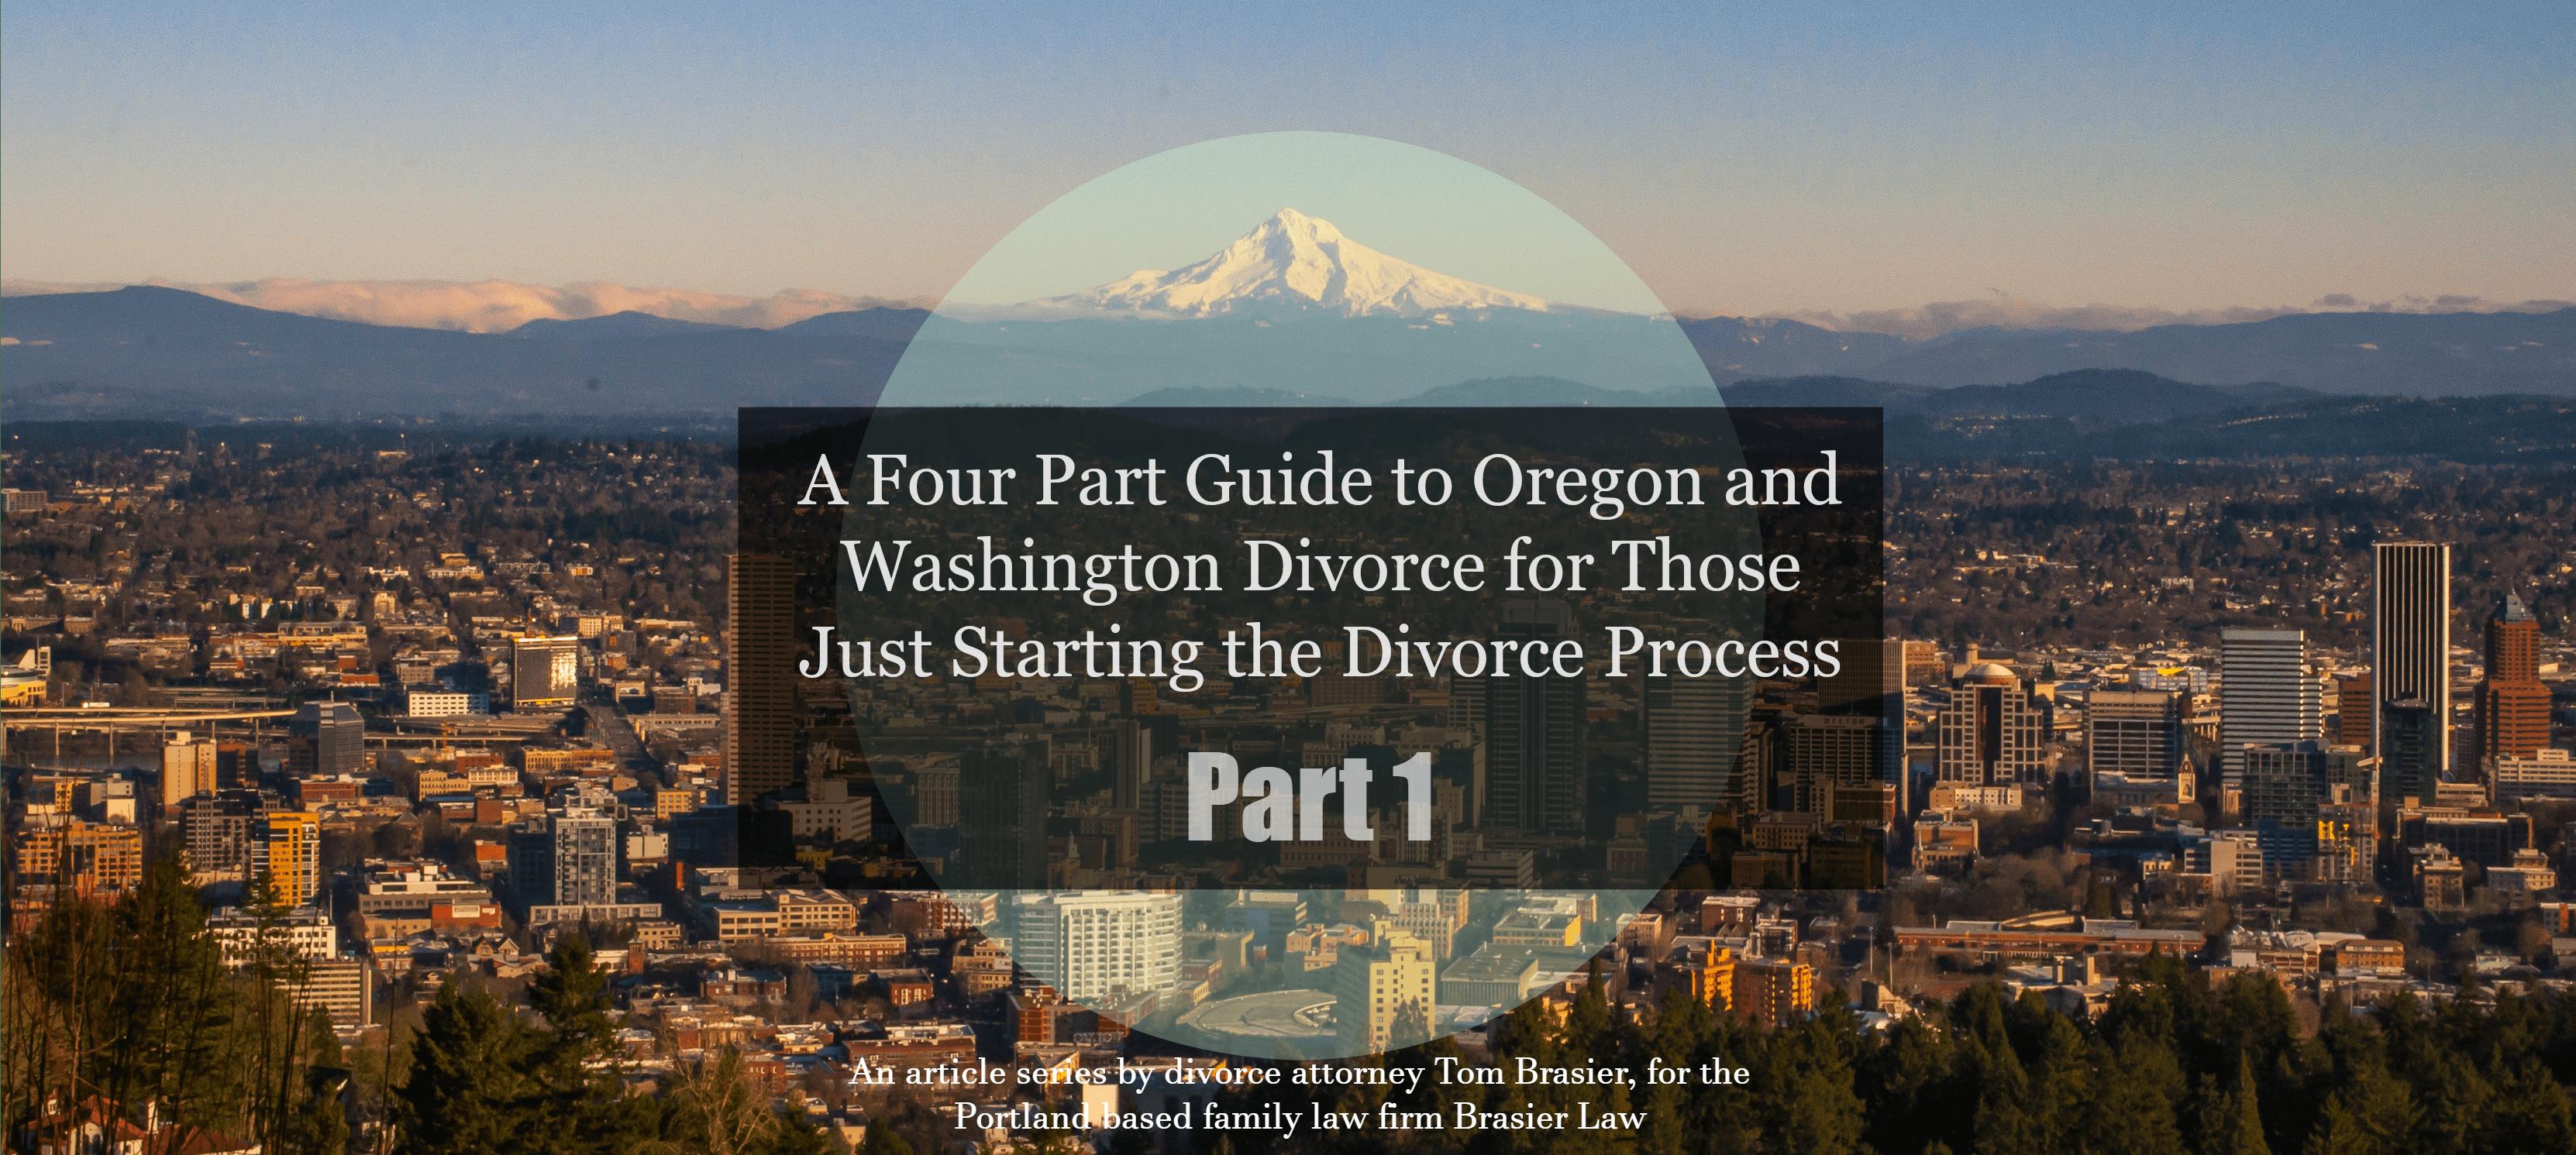 Washington and Oregon divorce guide, part 1